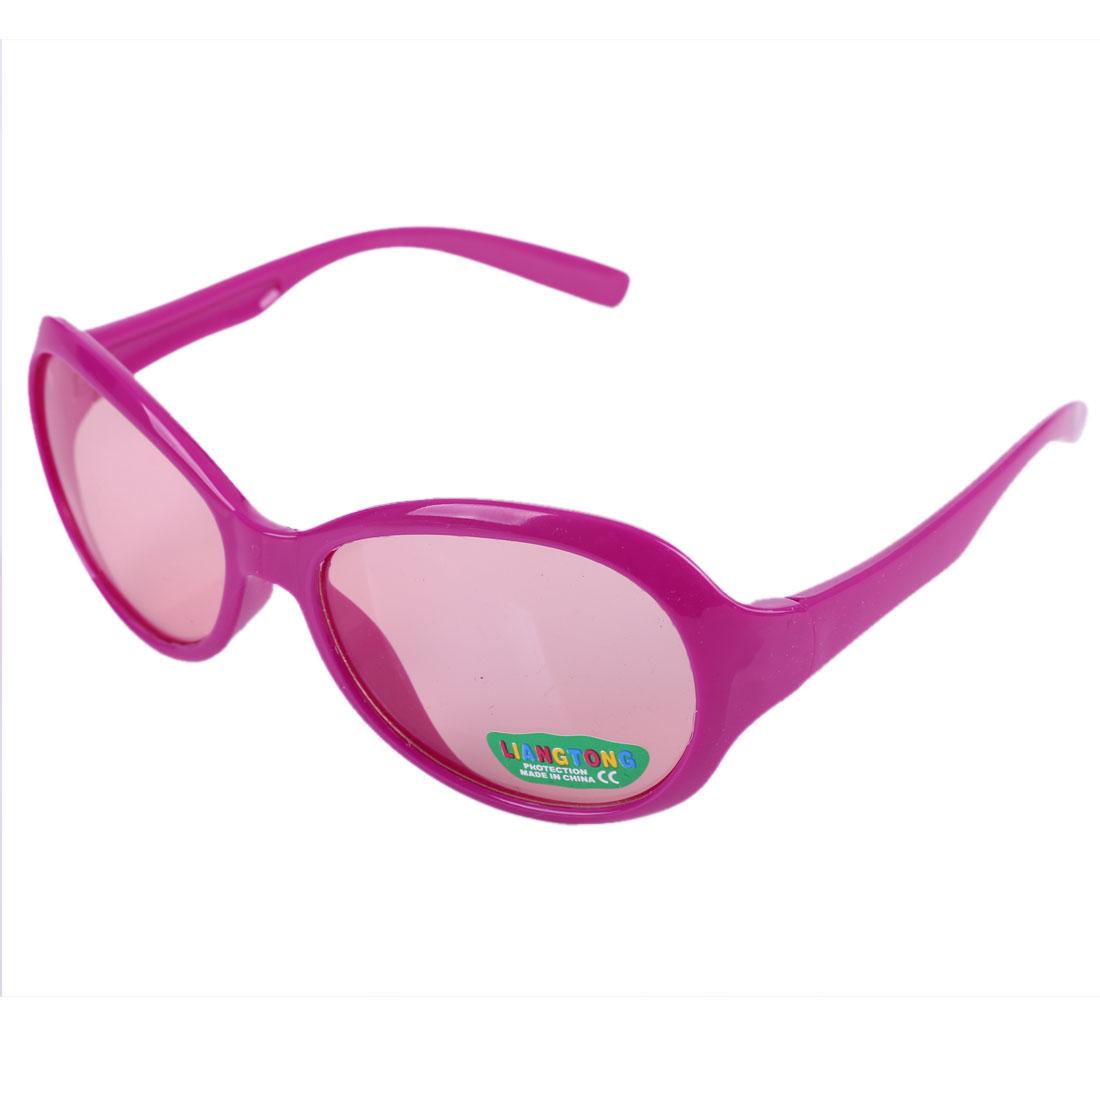 Fuchsia Plastic Full Frame Single Bridge Sunglasses for Children